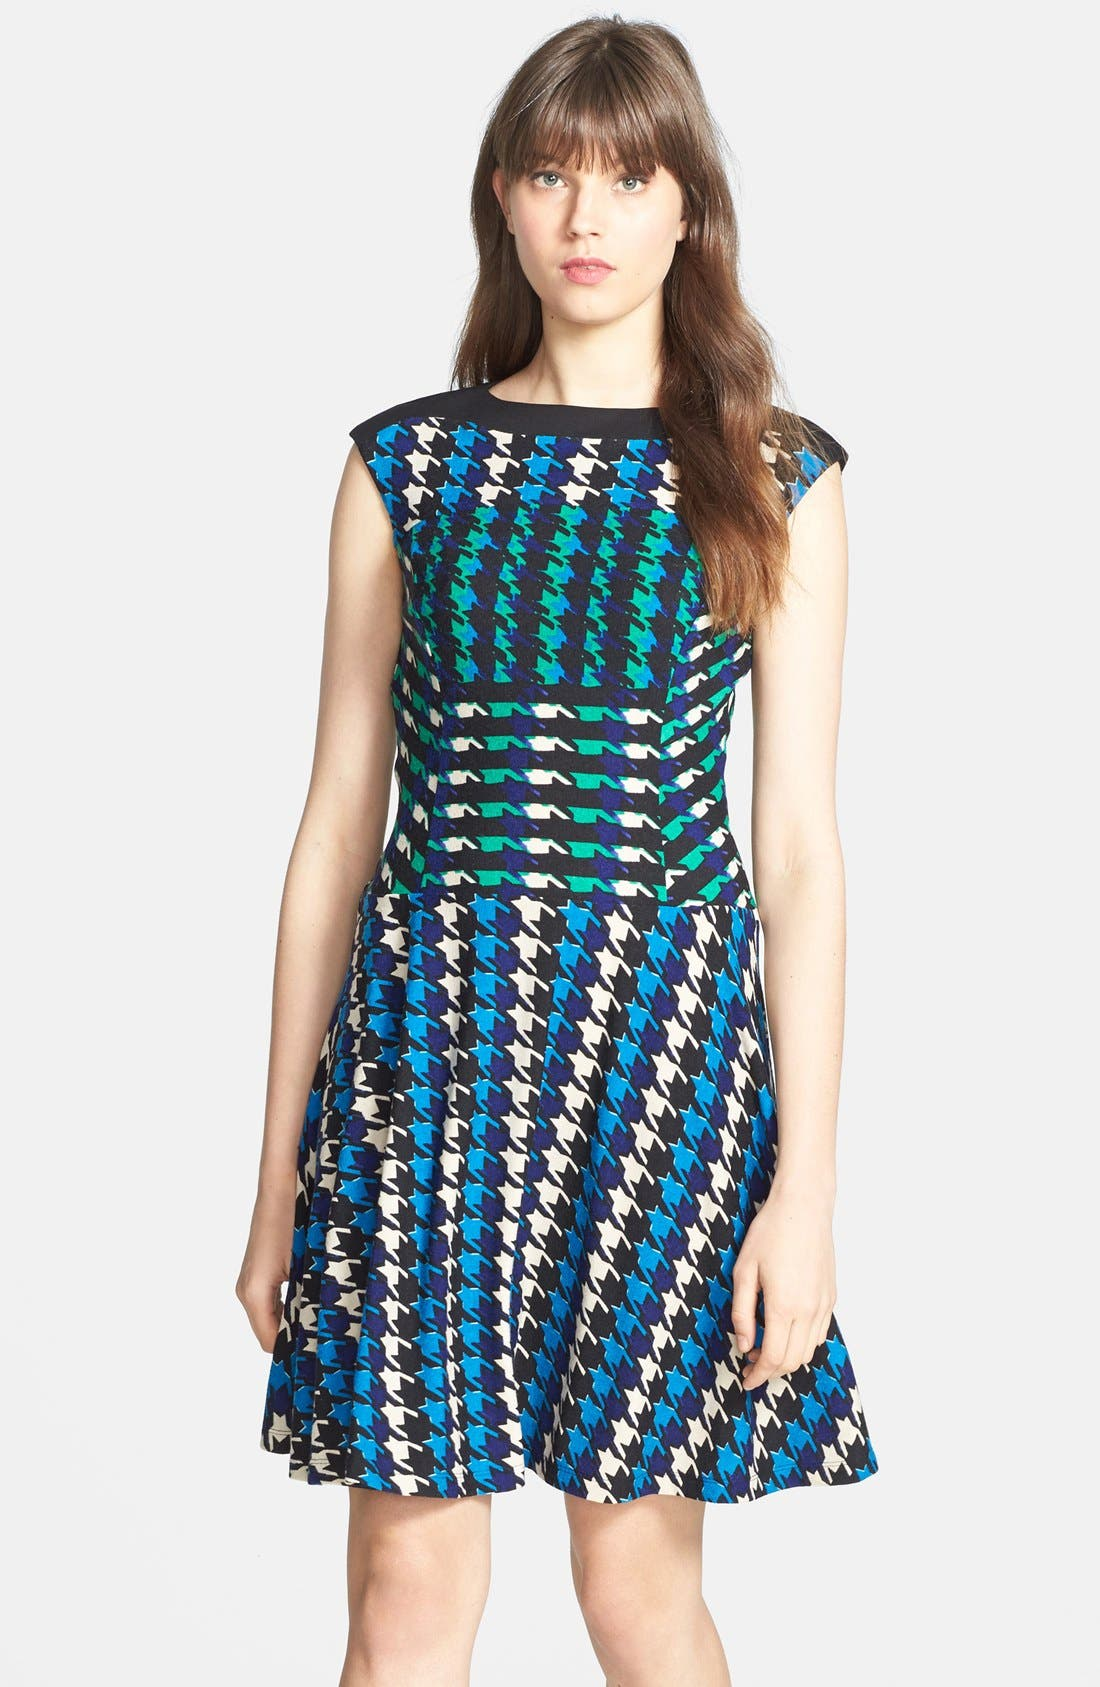 Main Image - Gabby Skye Houndstooth Print Ponte Knit Fit & Flare Dress